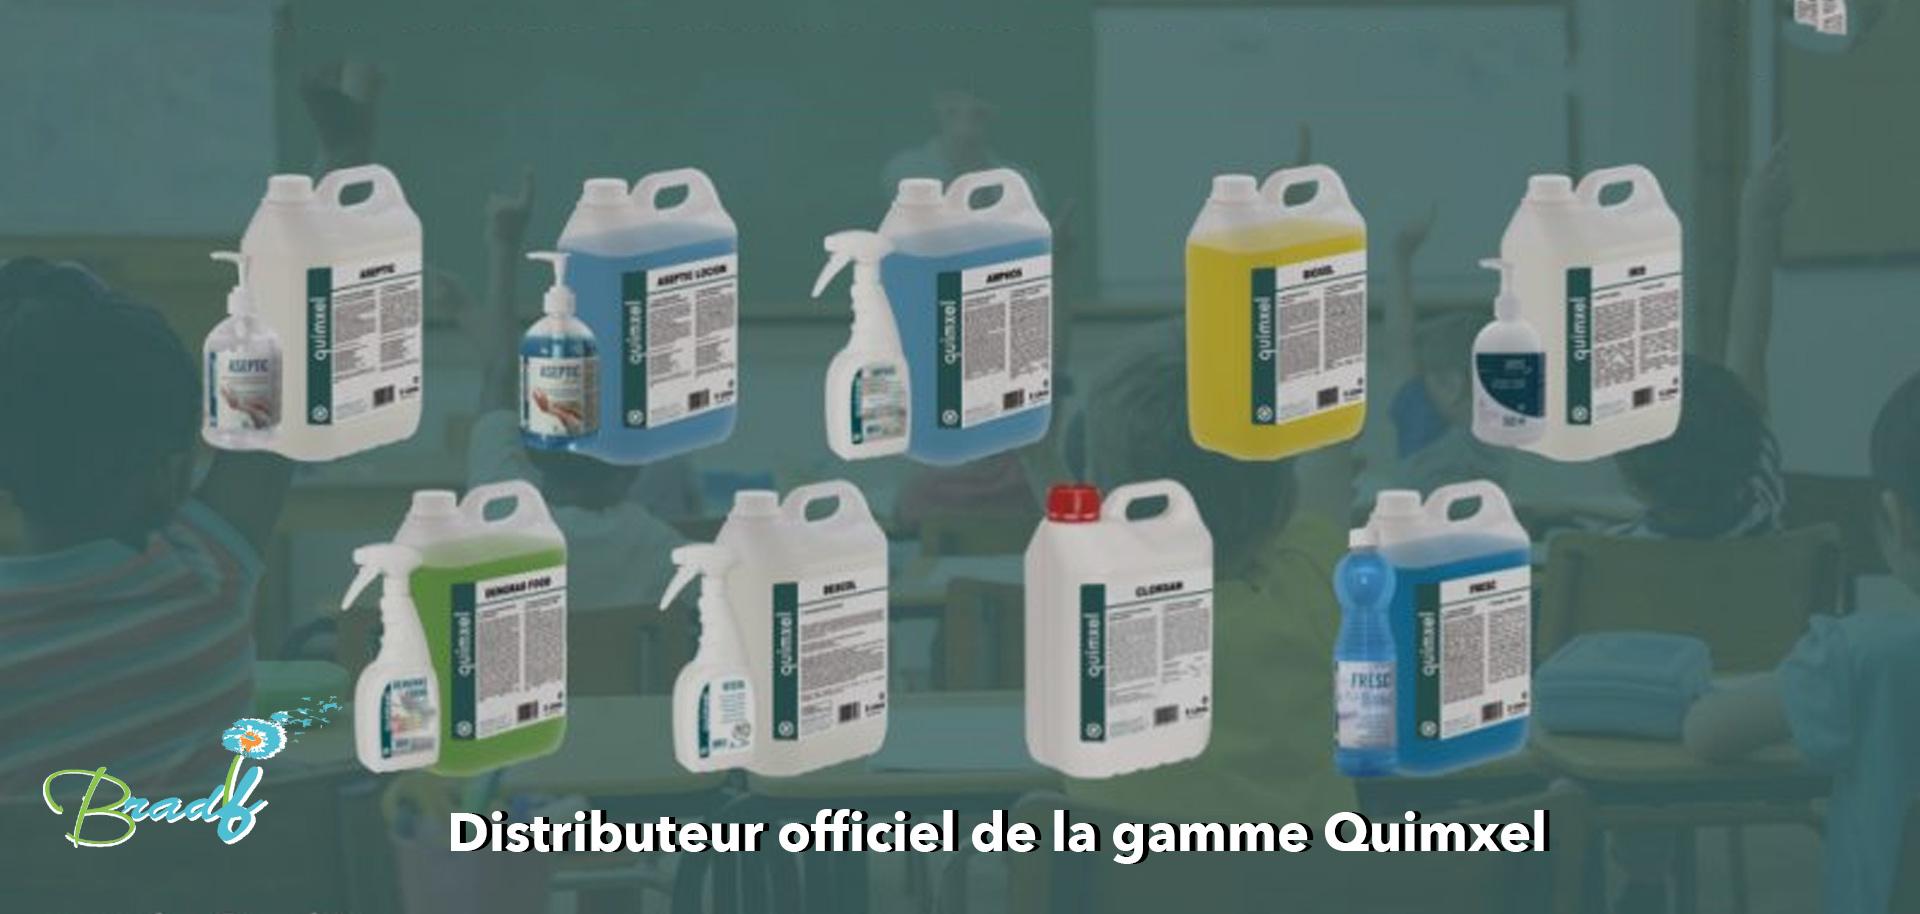 https://www.bradif.com/Quimxel maroc